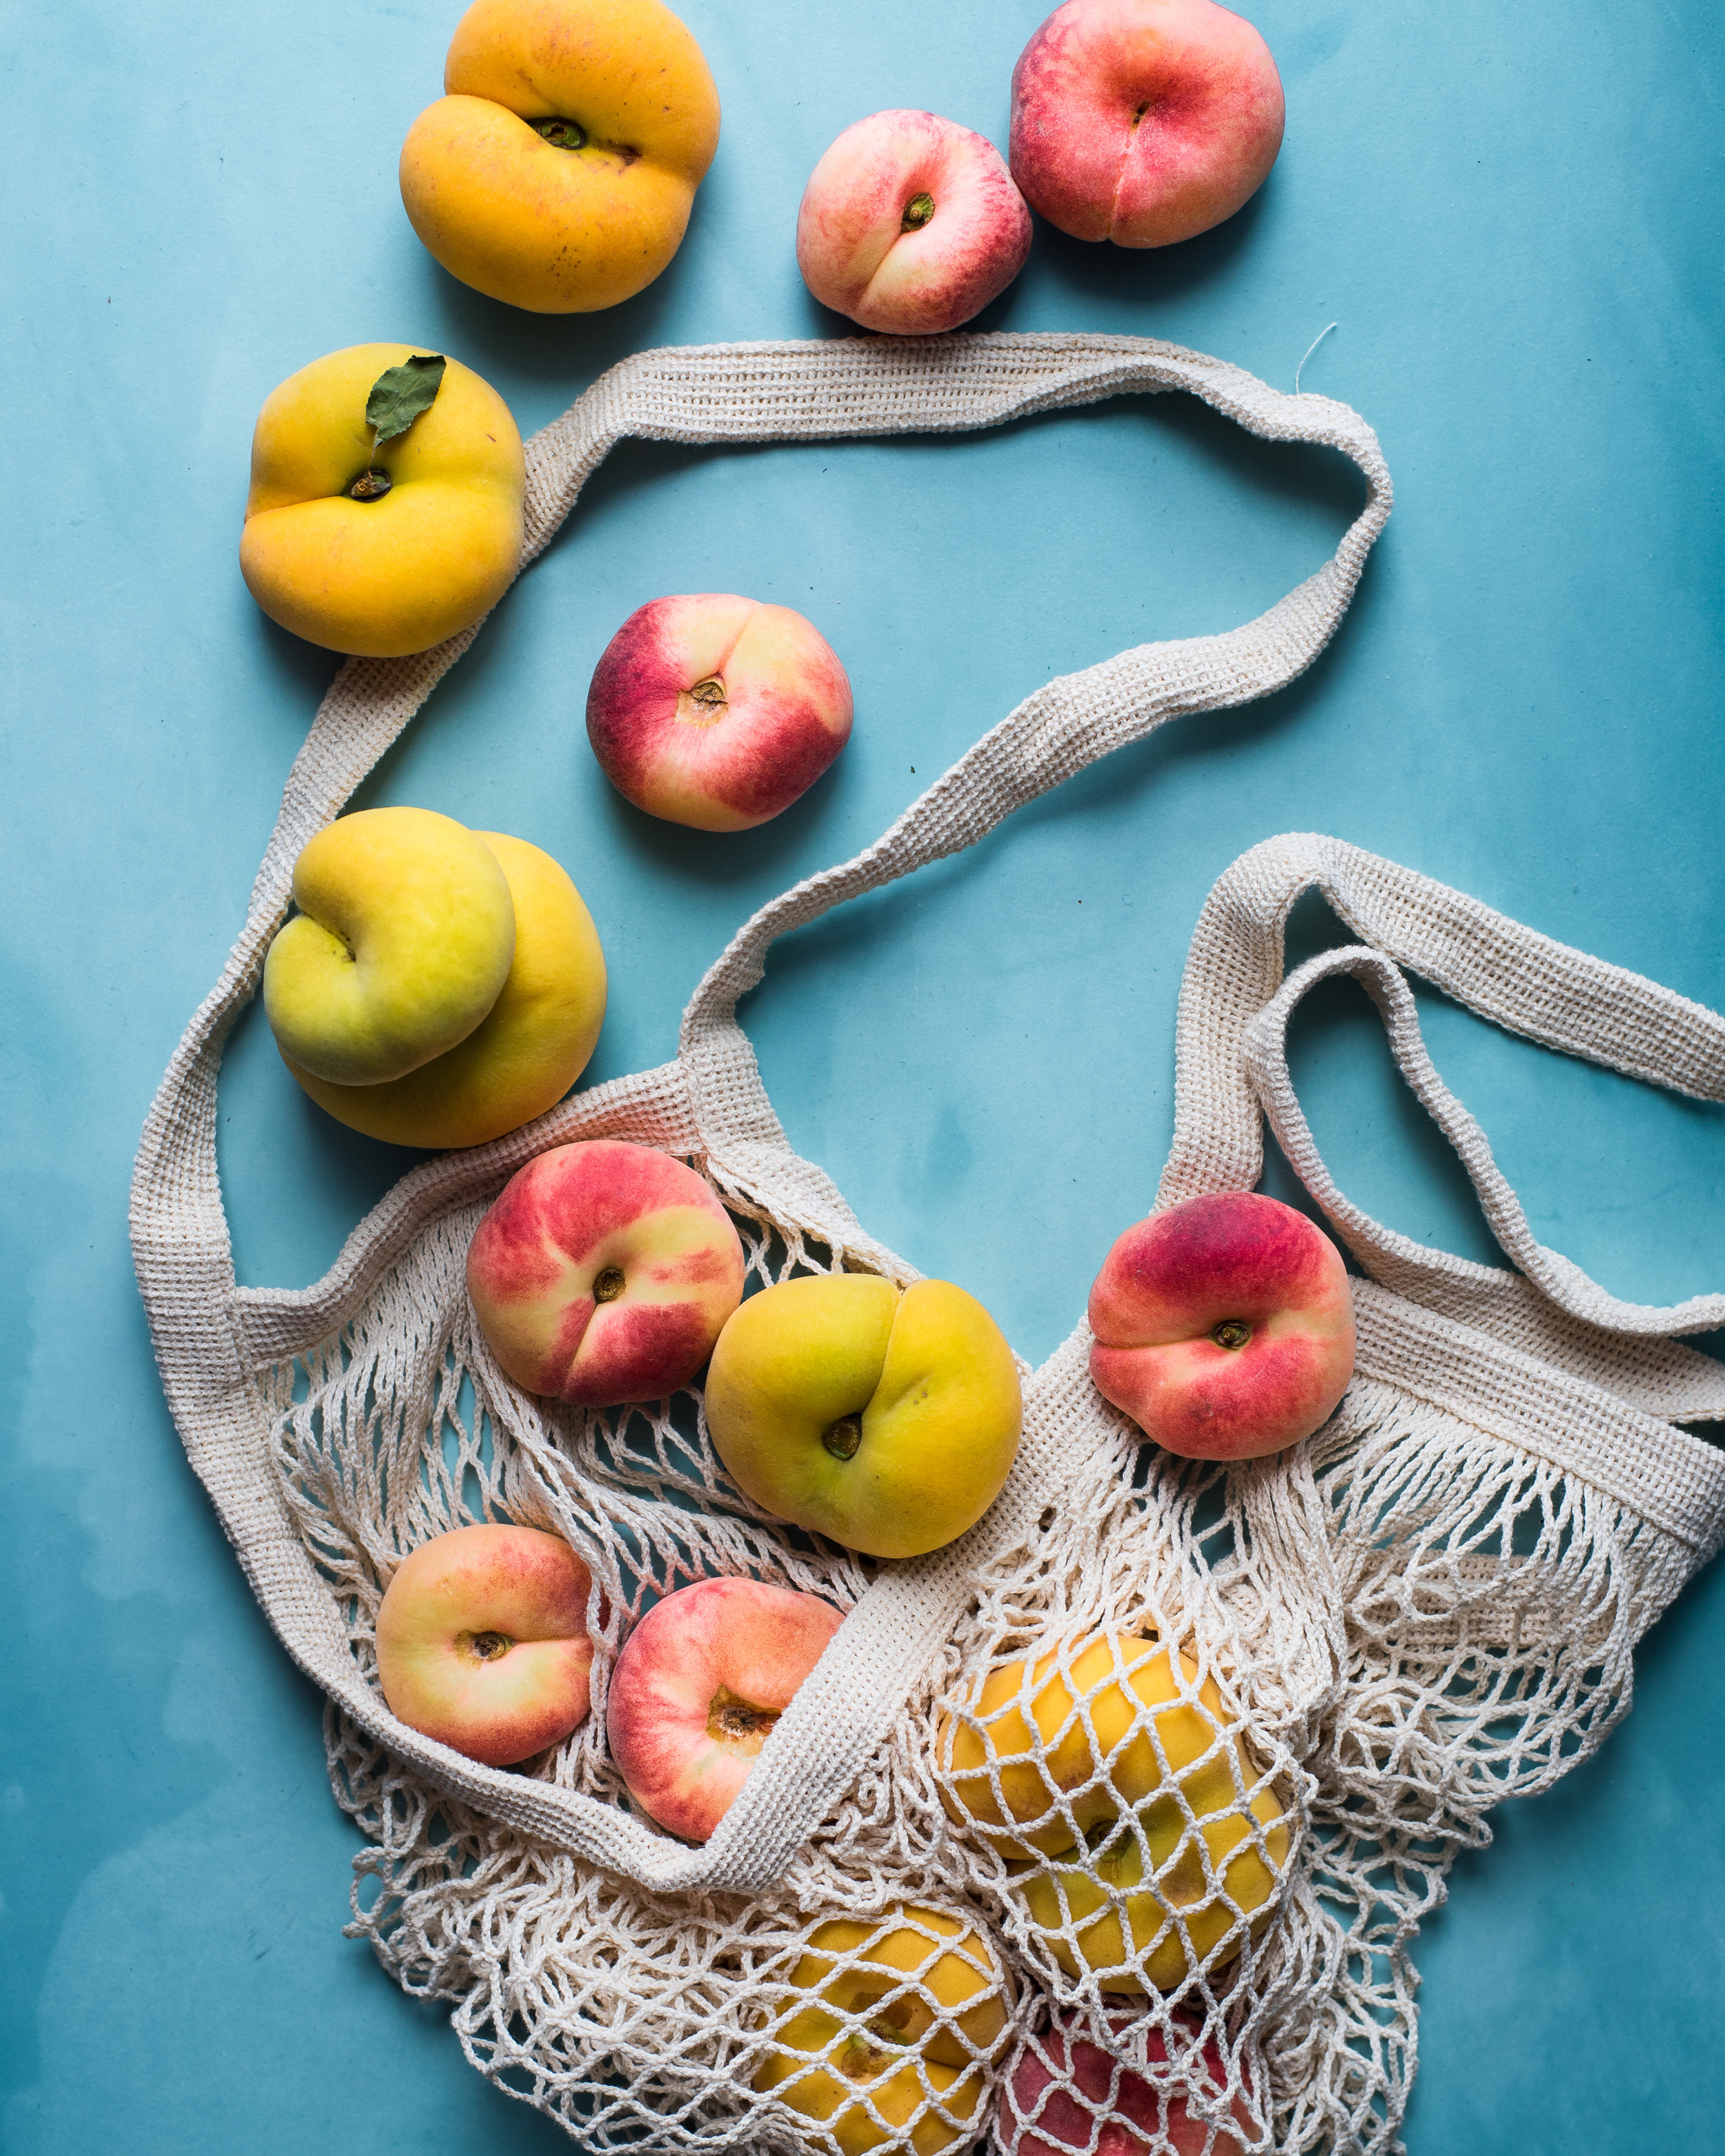 Food photography surfaces - food photography surfaces; use the code NISHA for 10% off.